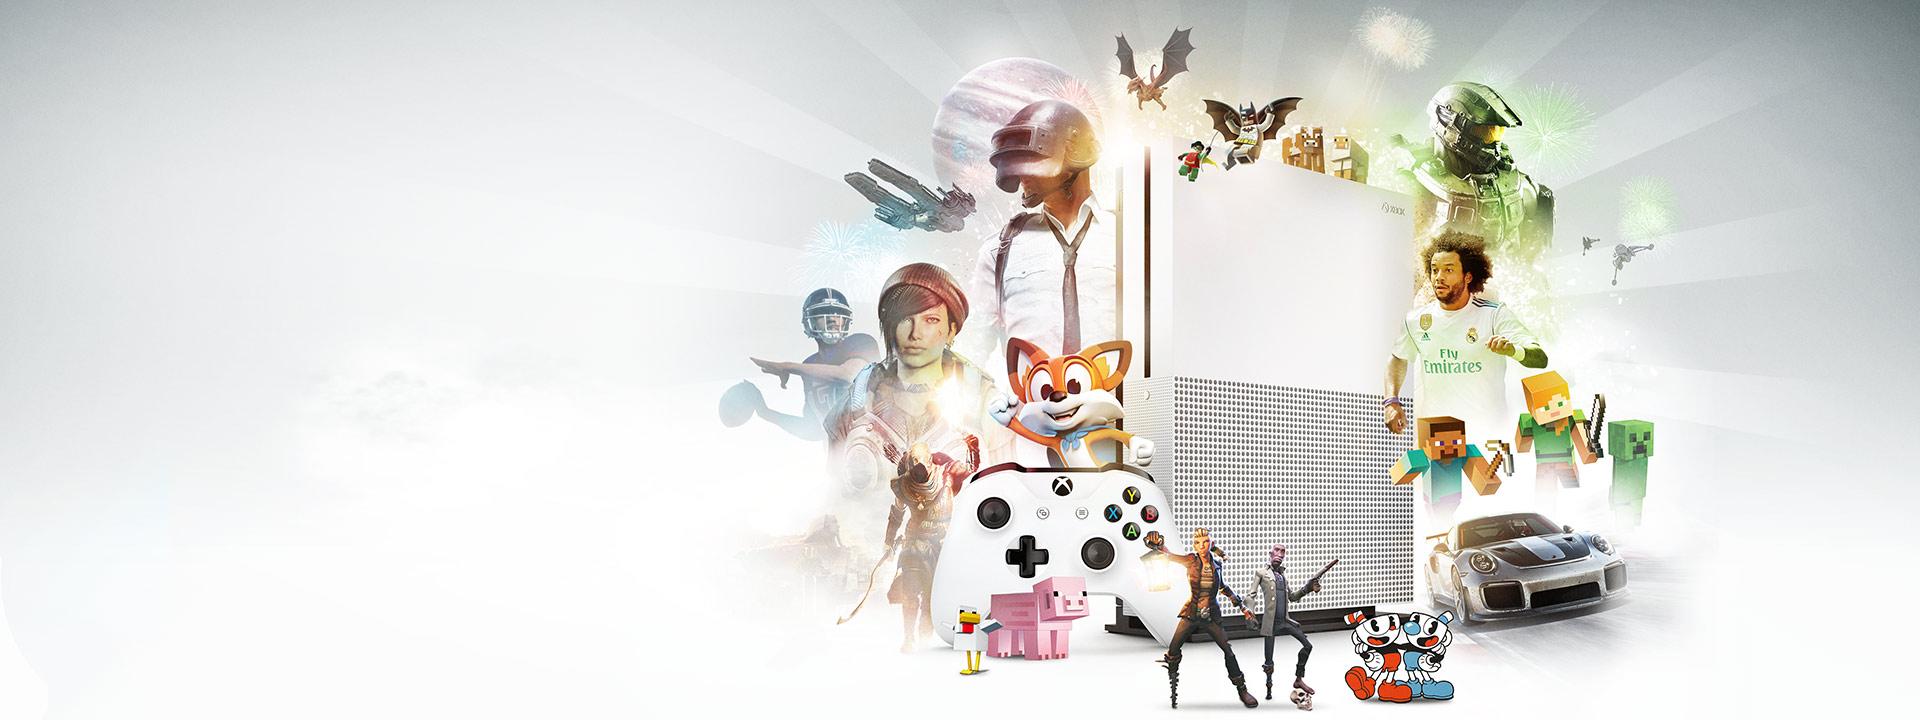 Sales Amp Specials This Weeks Xbox Live Deals